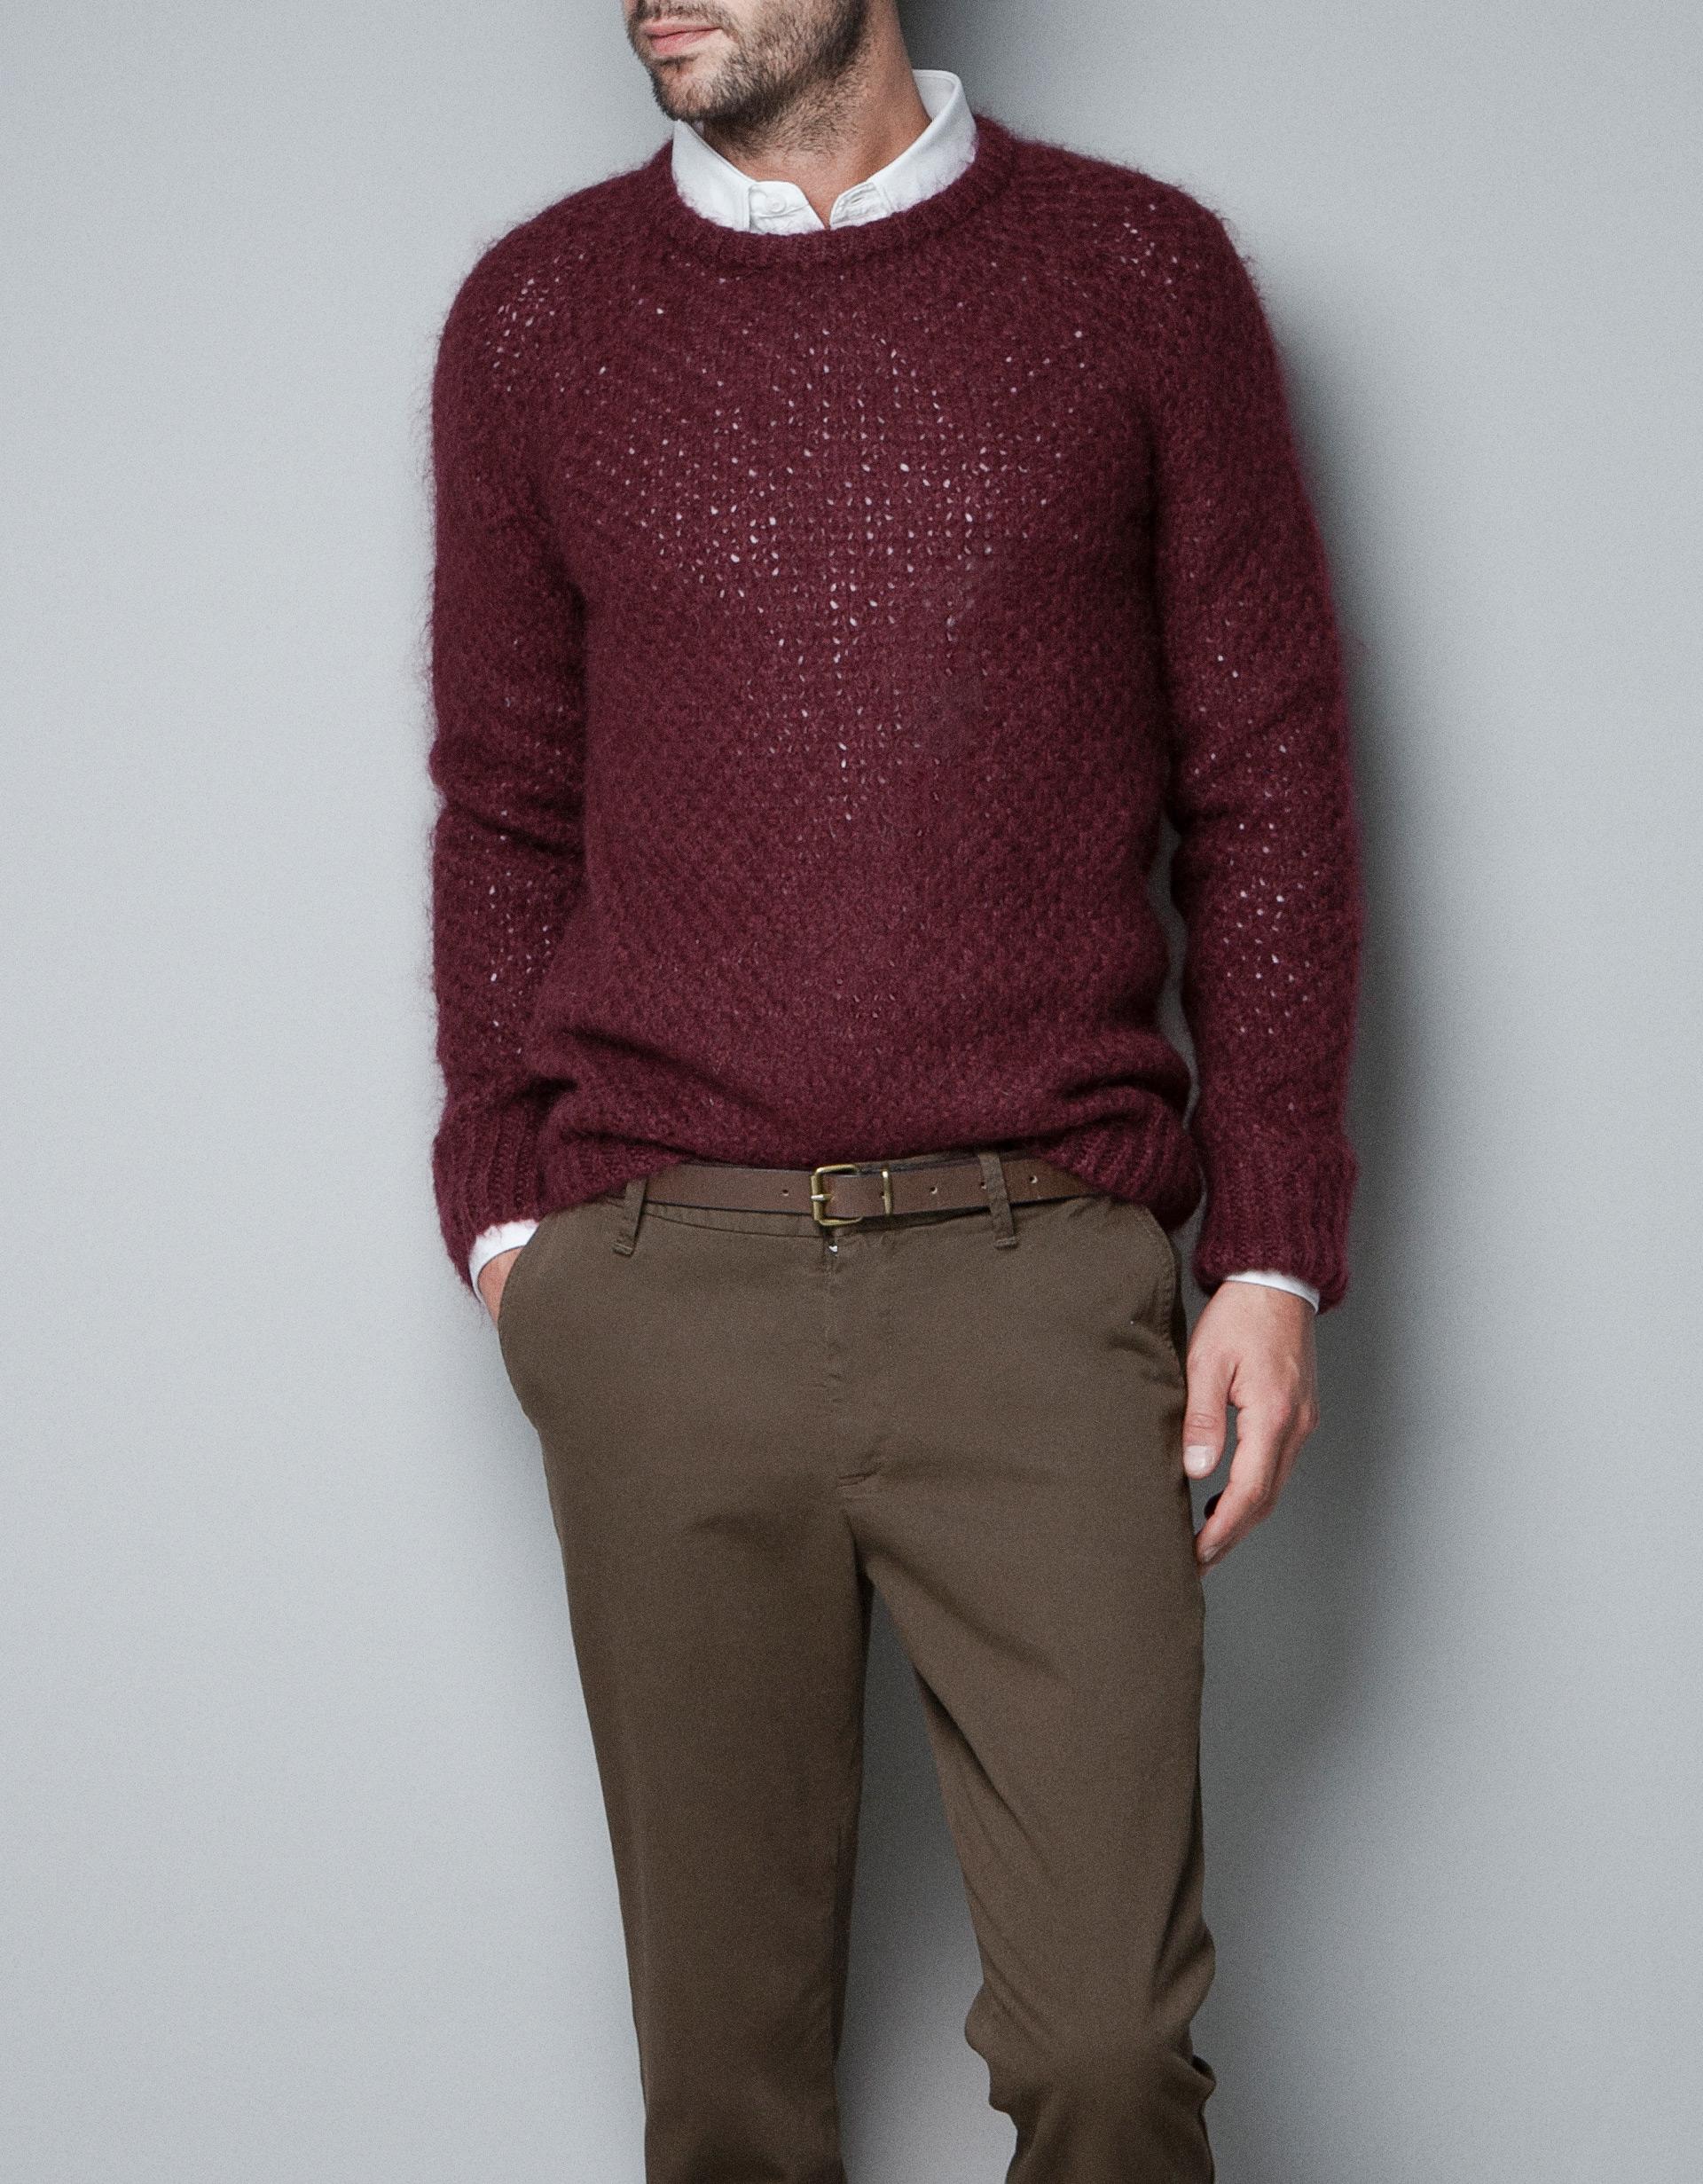 Zara sweater mens gray cardigan sweater - Hm herren jeans ...